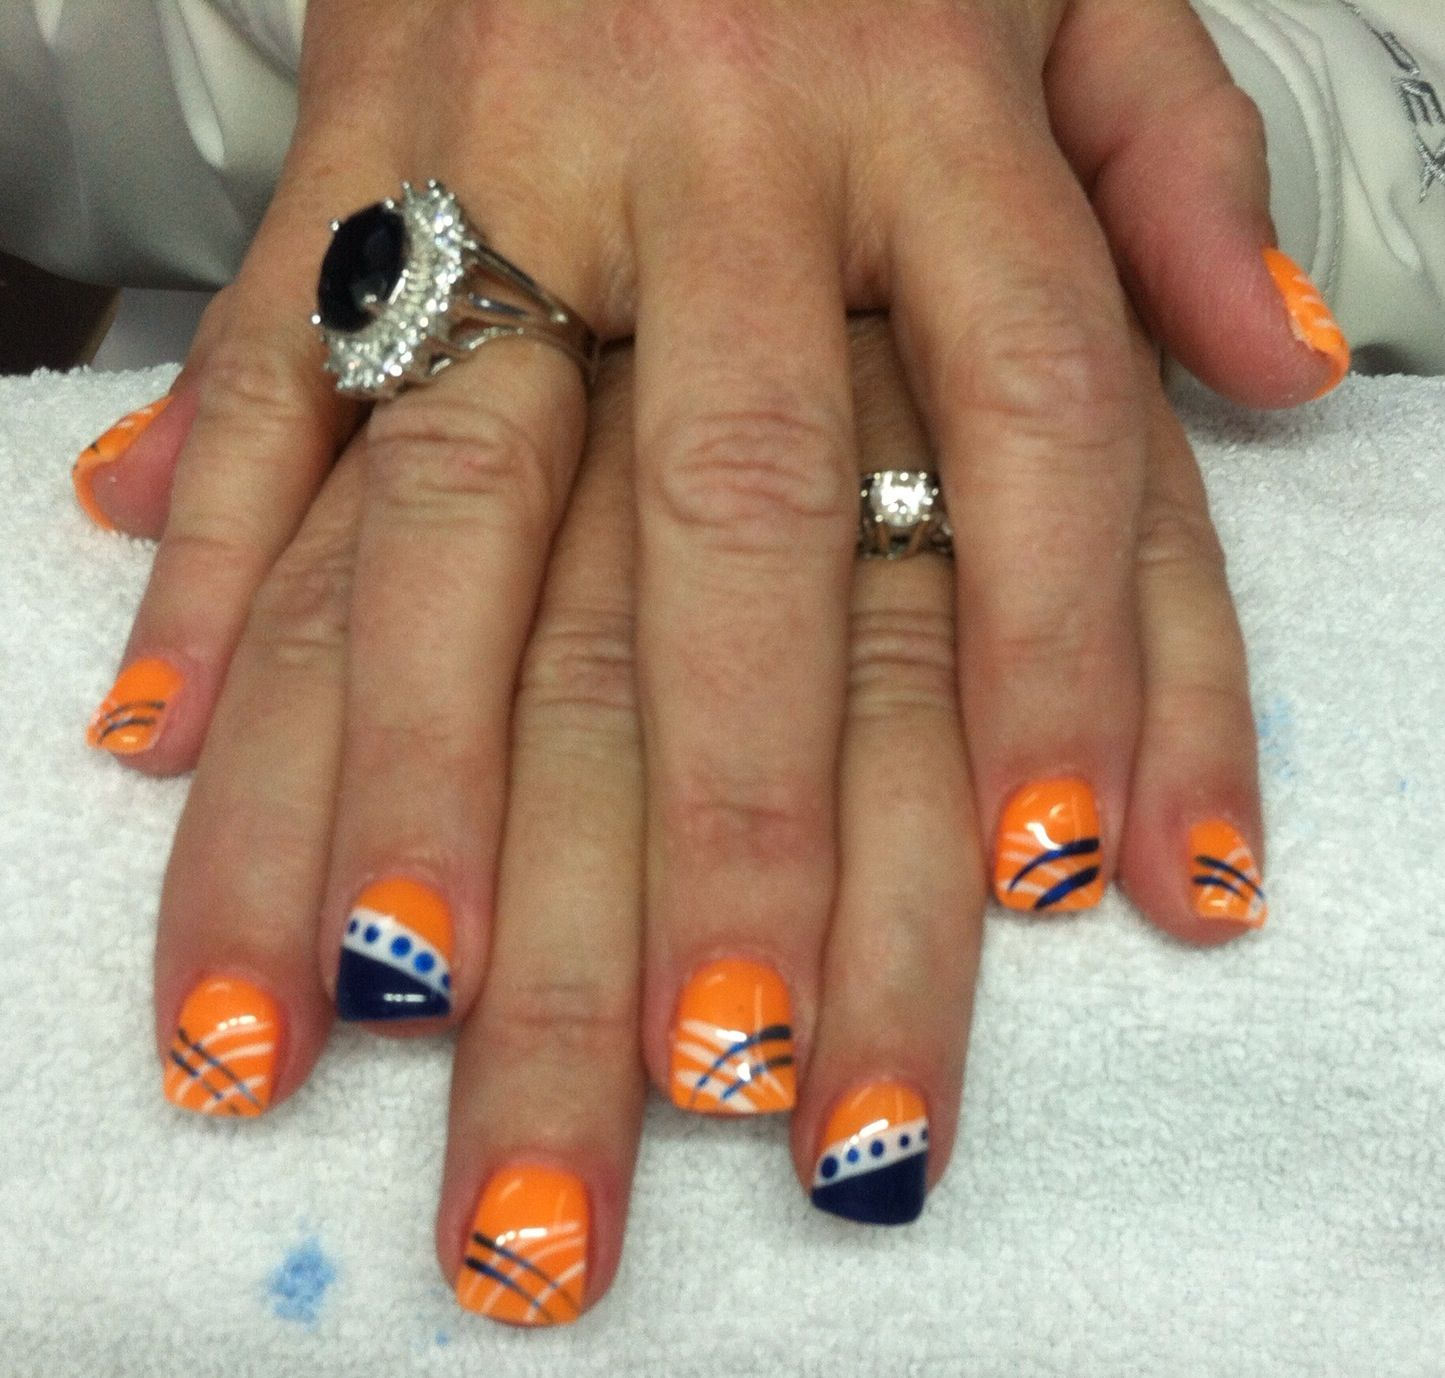 Denver Bronco nails! | Nails! | Pinterest | Denver broncos nails ...